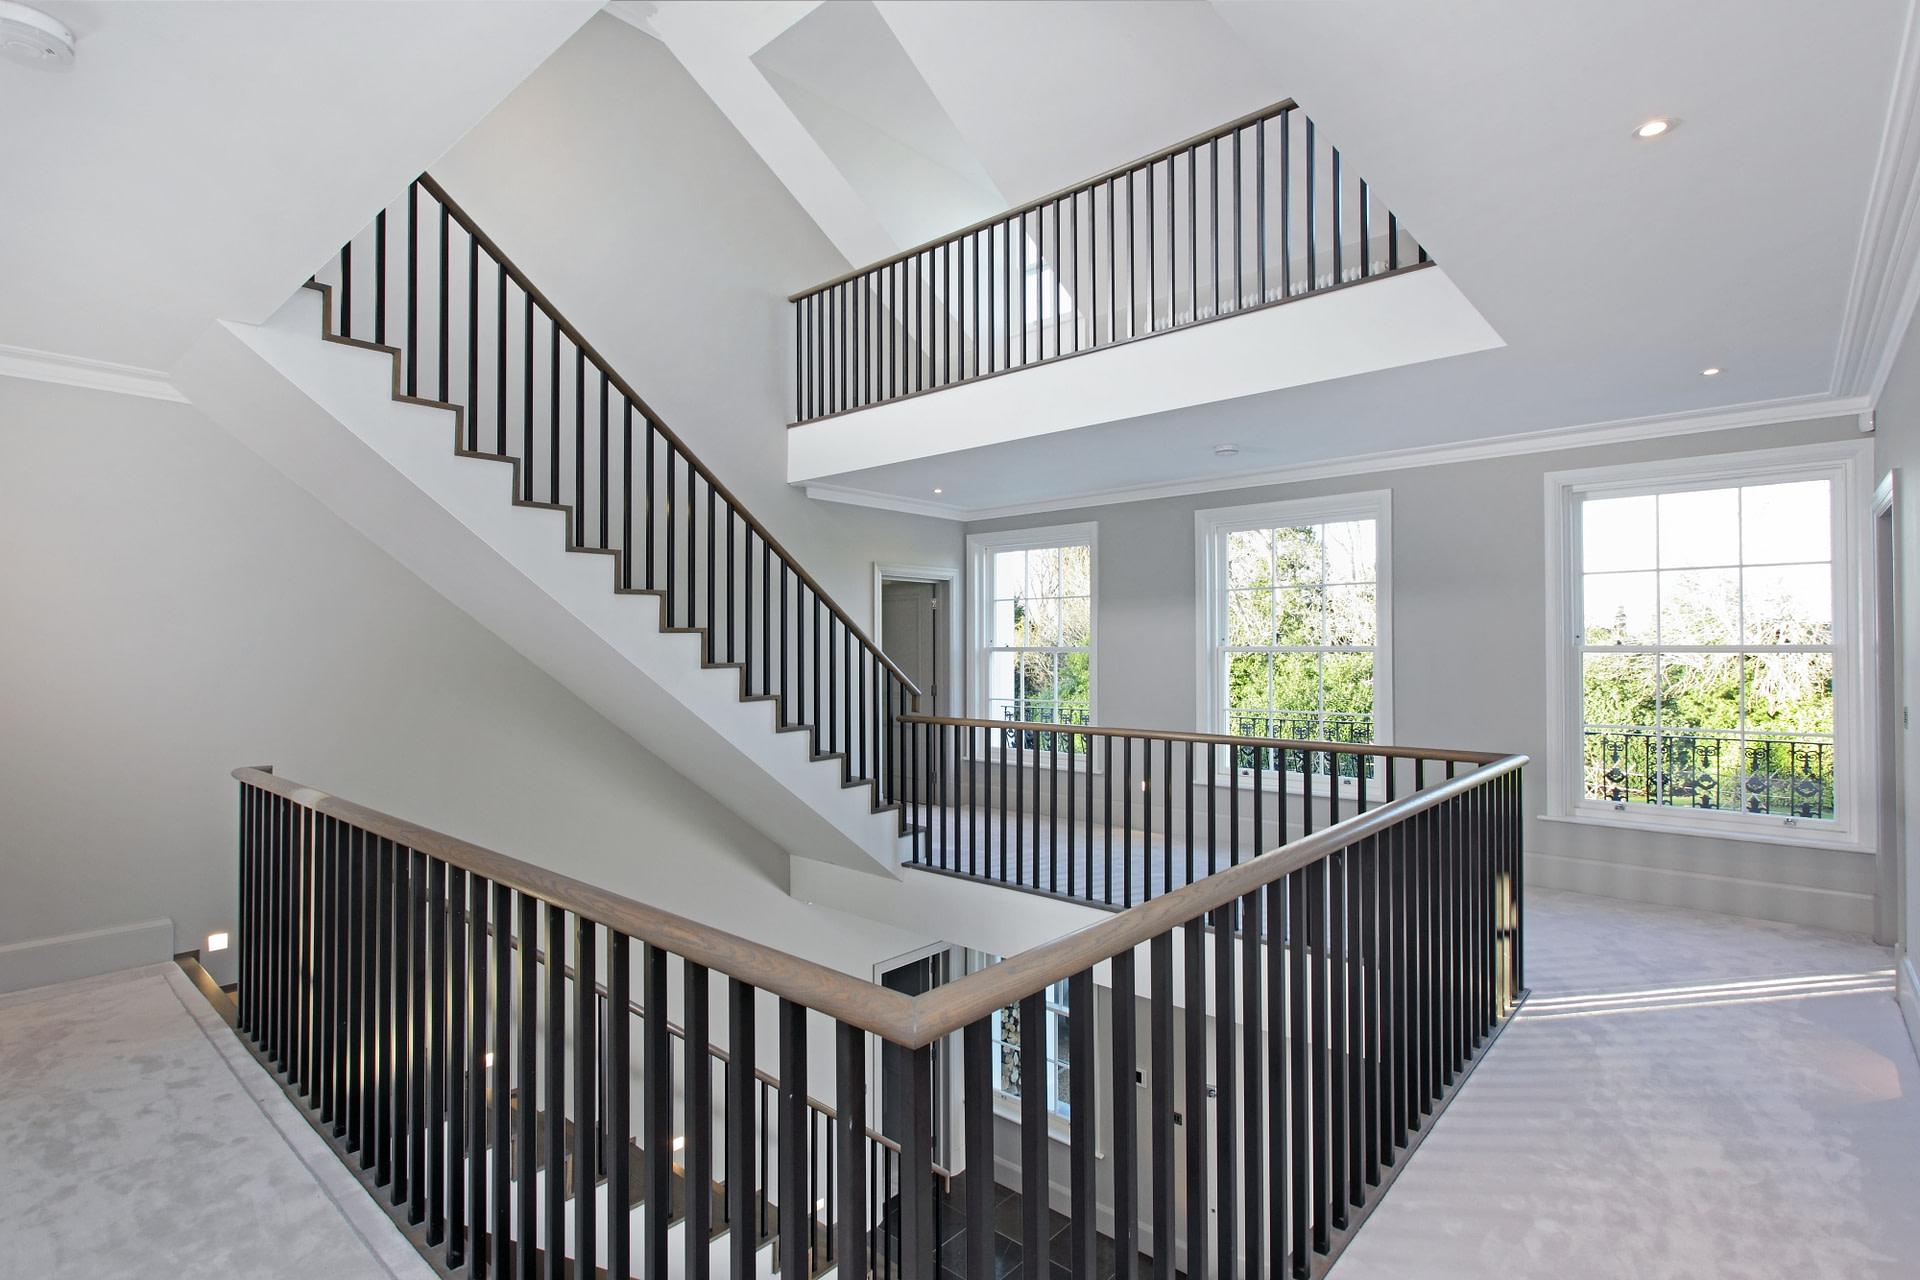 31 Holmewood Ridge staircase